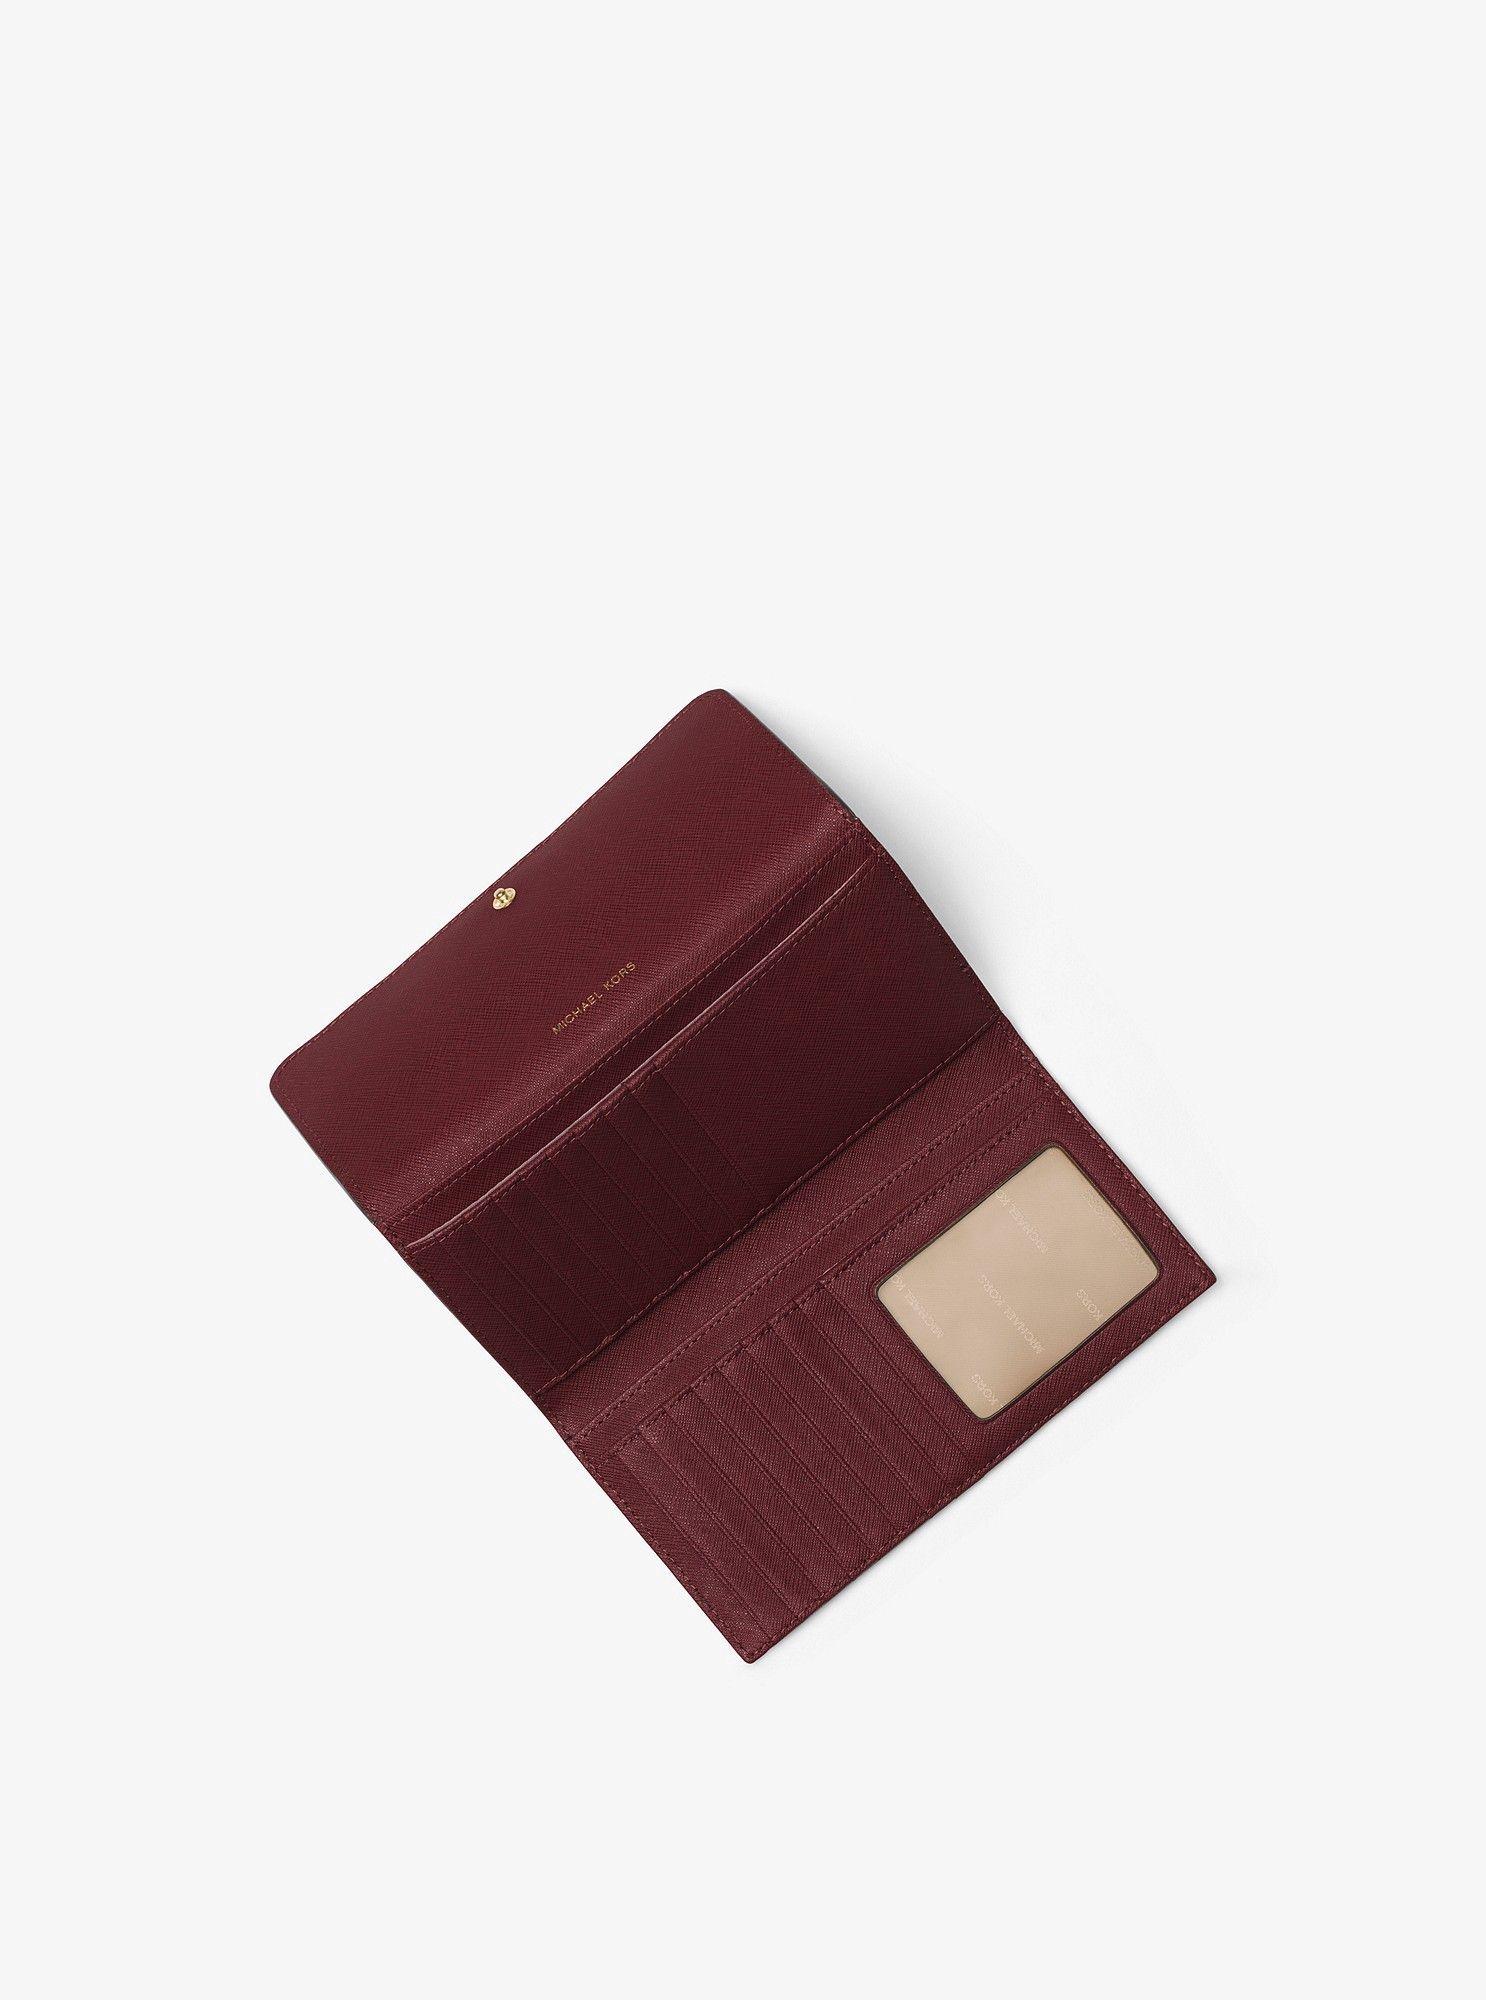 25980cc72642 Michael Kors Mercer Tri-Fold Leather Wallet - Acorn | Products